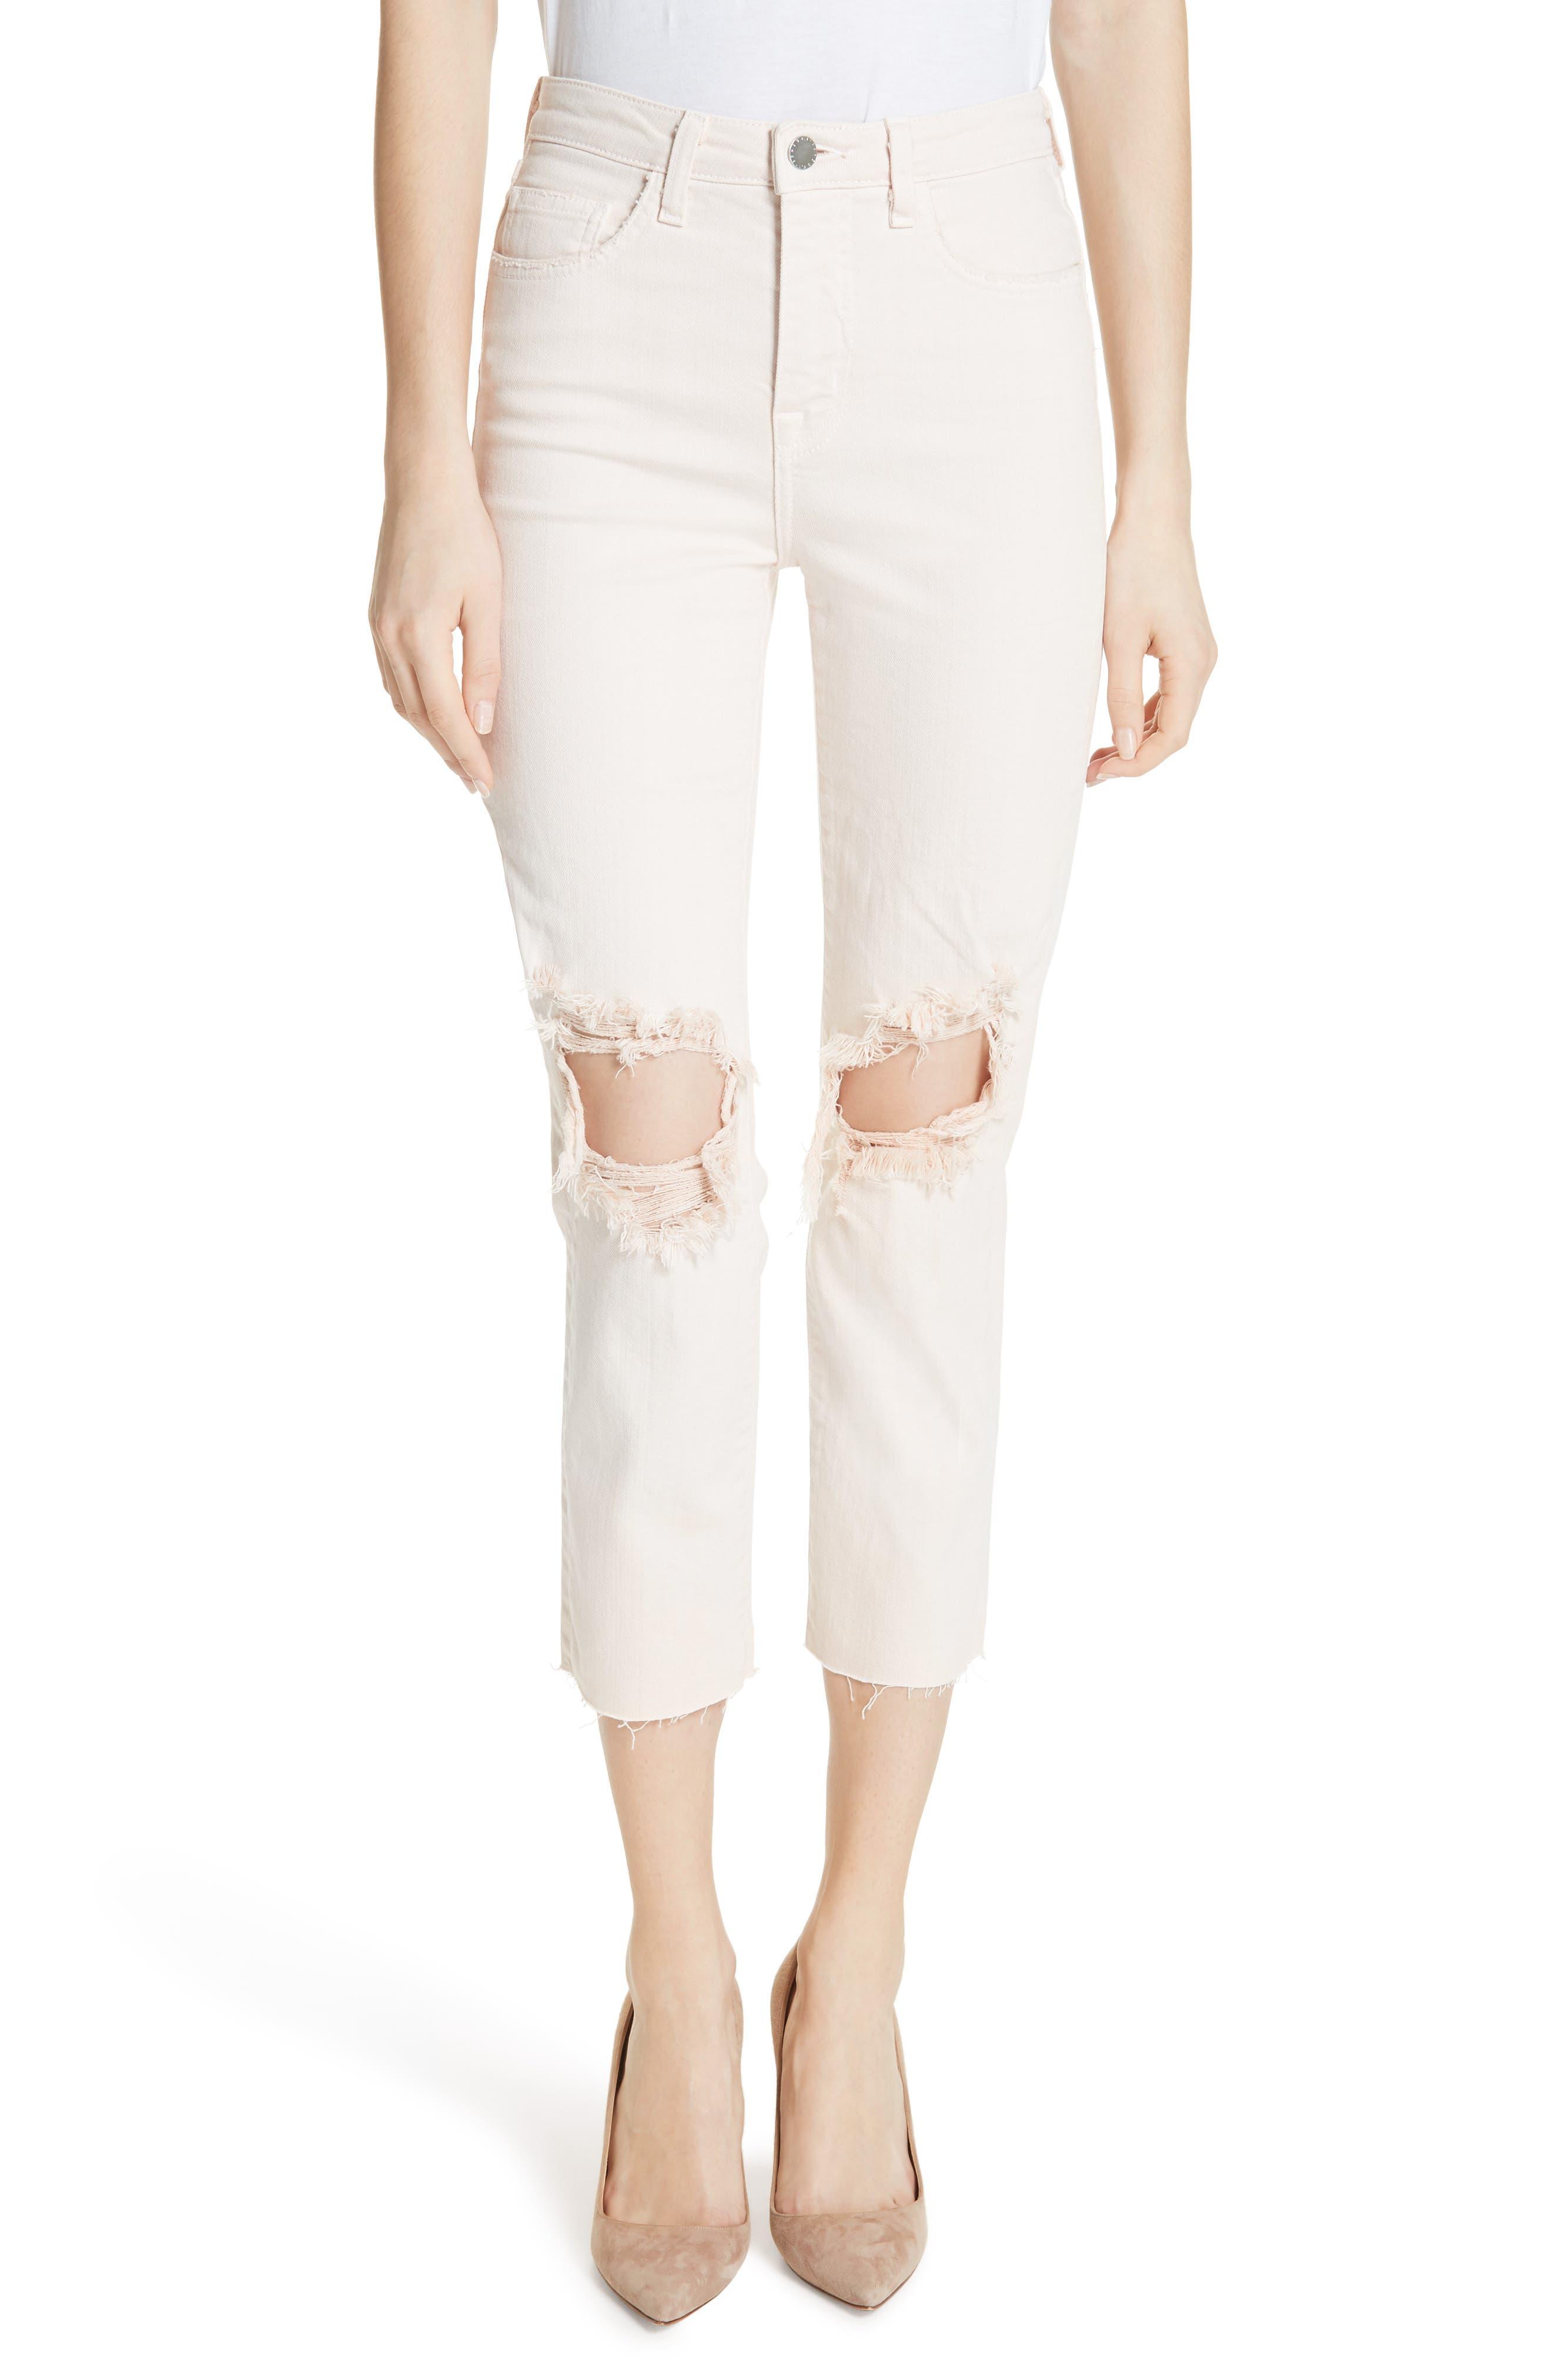 Audrina Ripped Straight Leg Crop Jeans,                             Main thumbnail 1, color,                             Quartz Worn Destruct